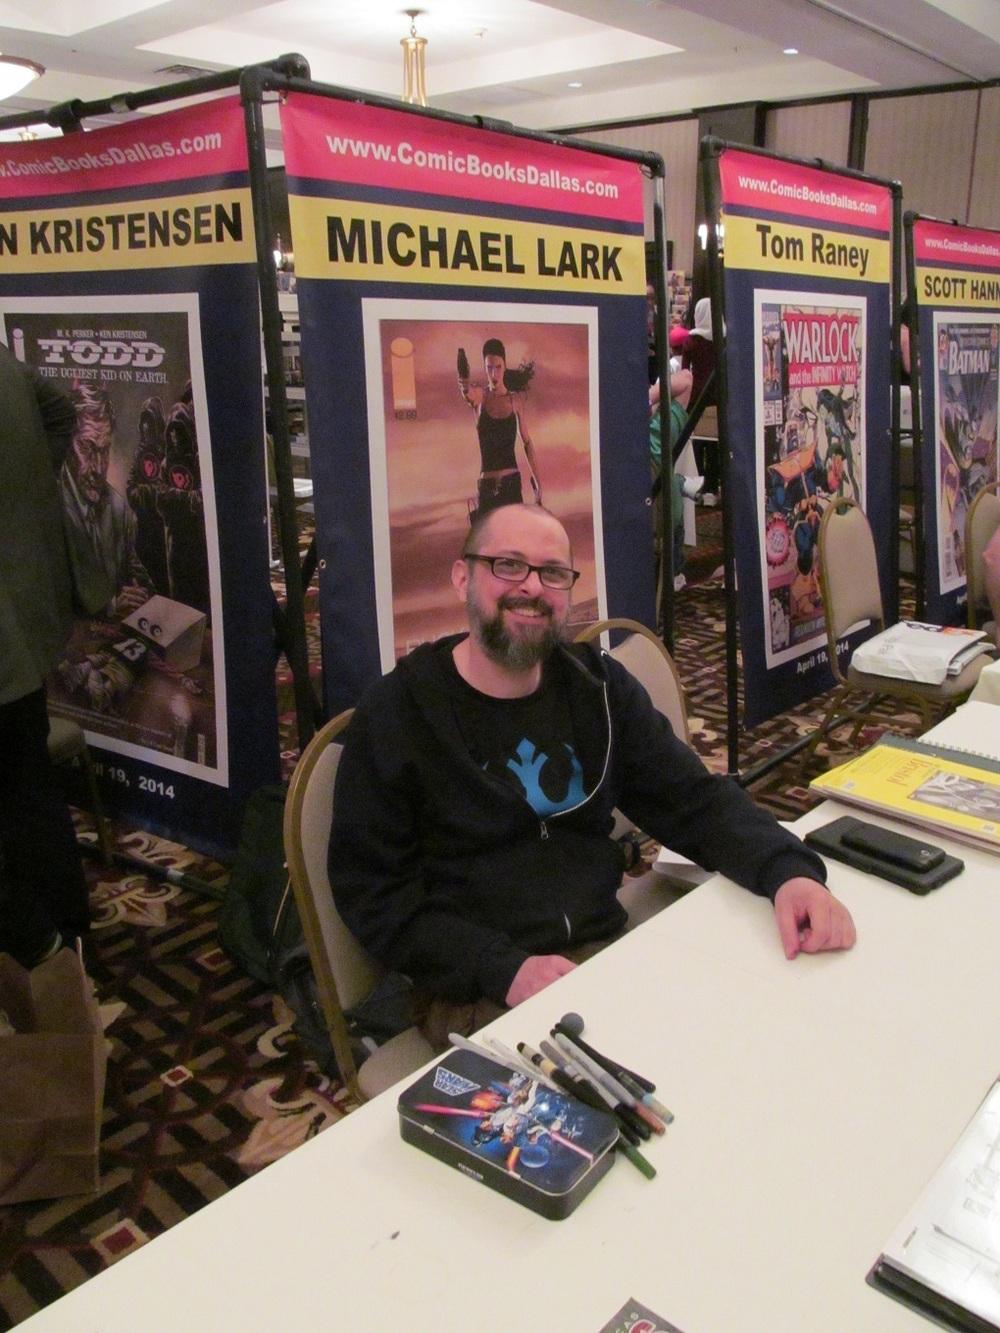 Michael Lark